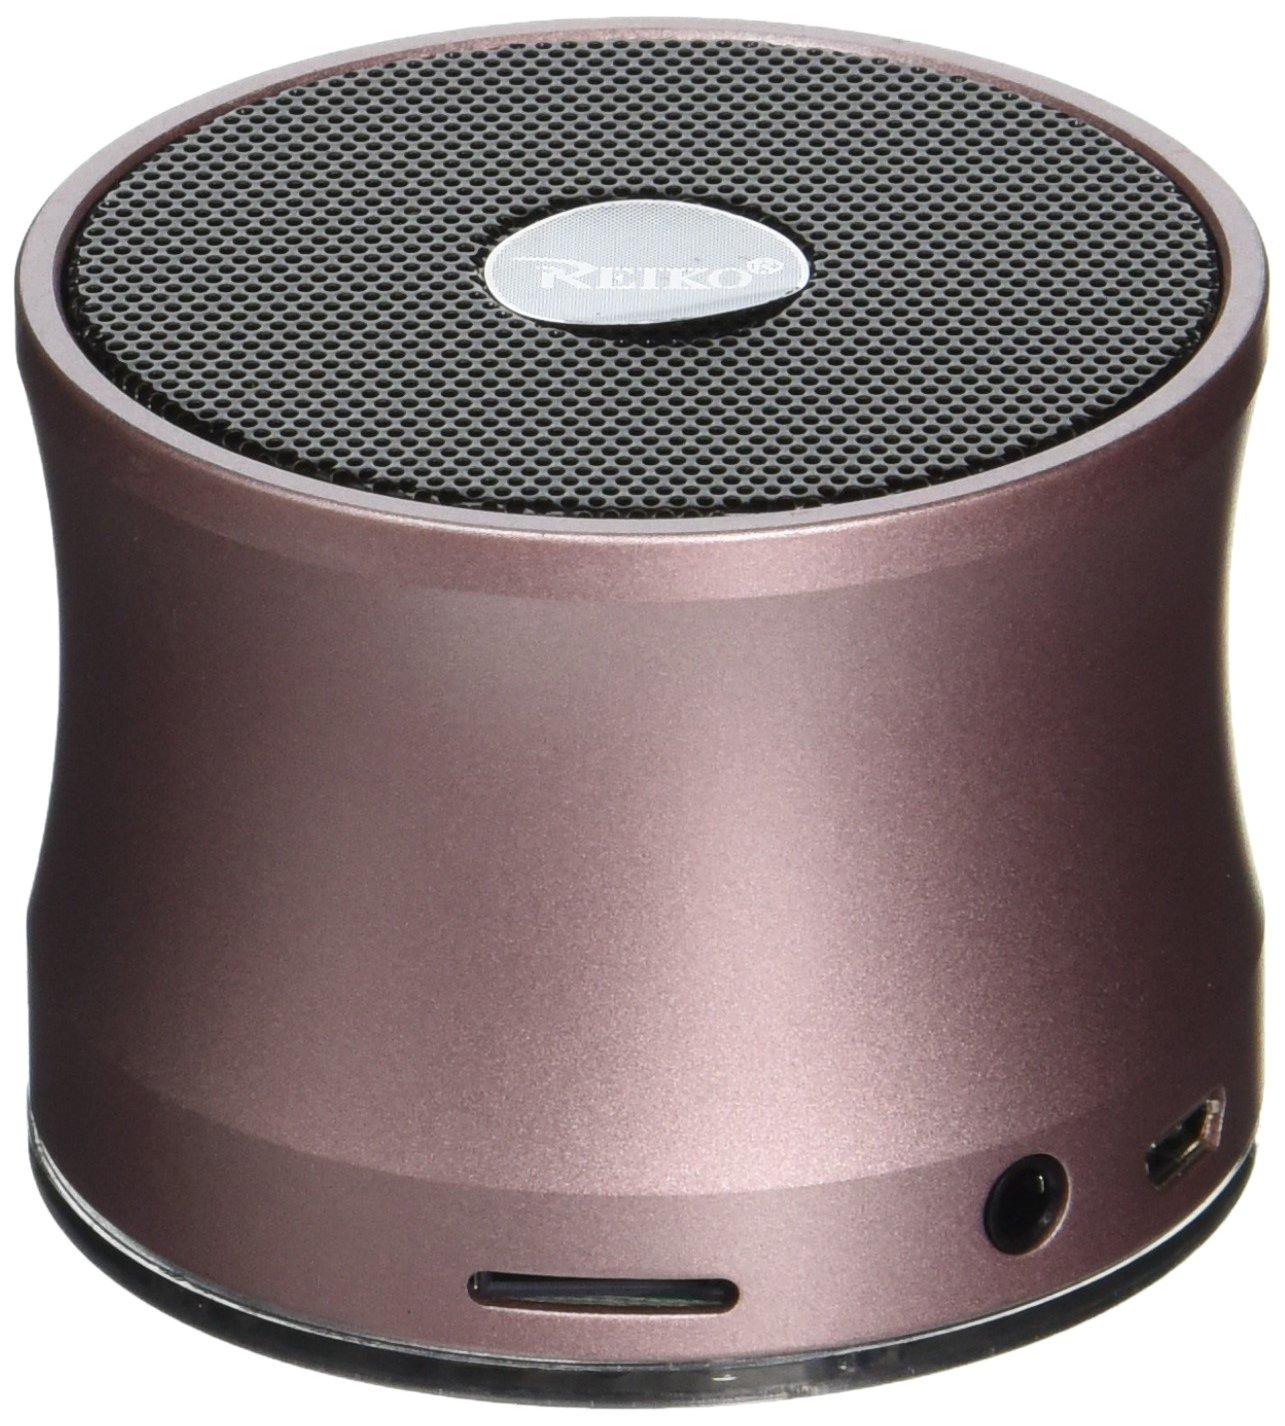 Reiko Universal Mini Bluetooth Speaker for iPhone 6/ 6S/6...